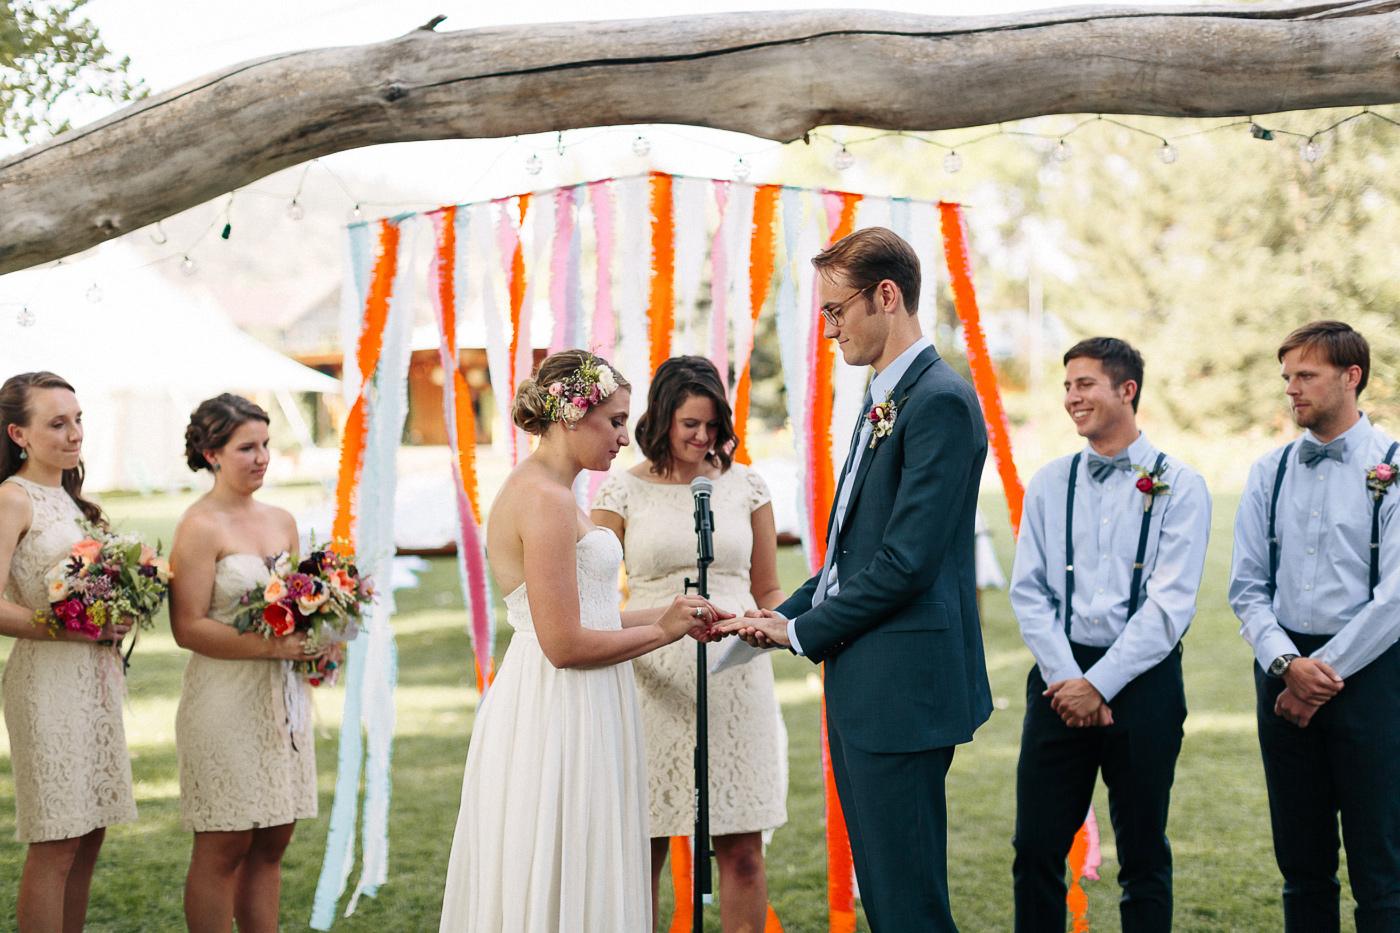 Lyons-Farmette-Wedding-Photographer-Lucy-Austin-Flash-Mob-Dance-25.jpg